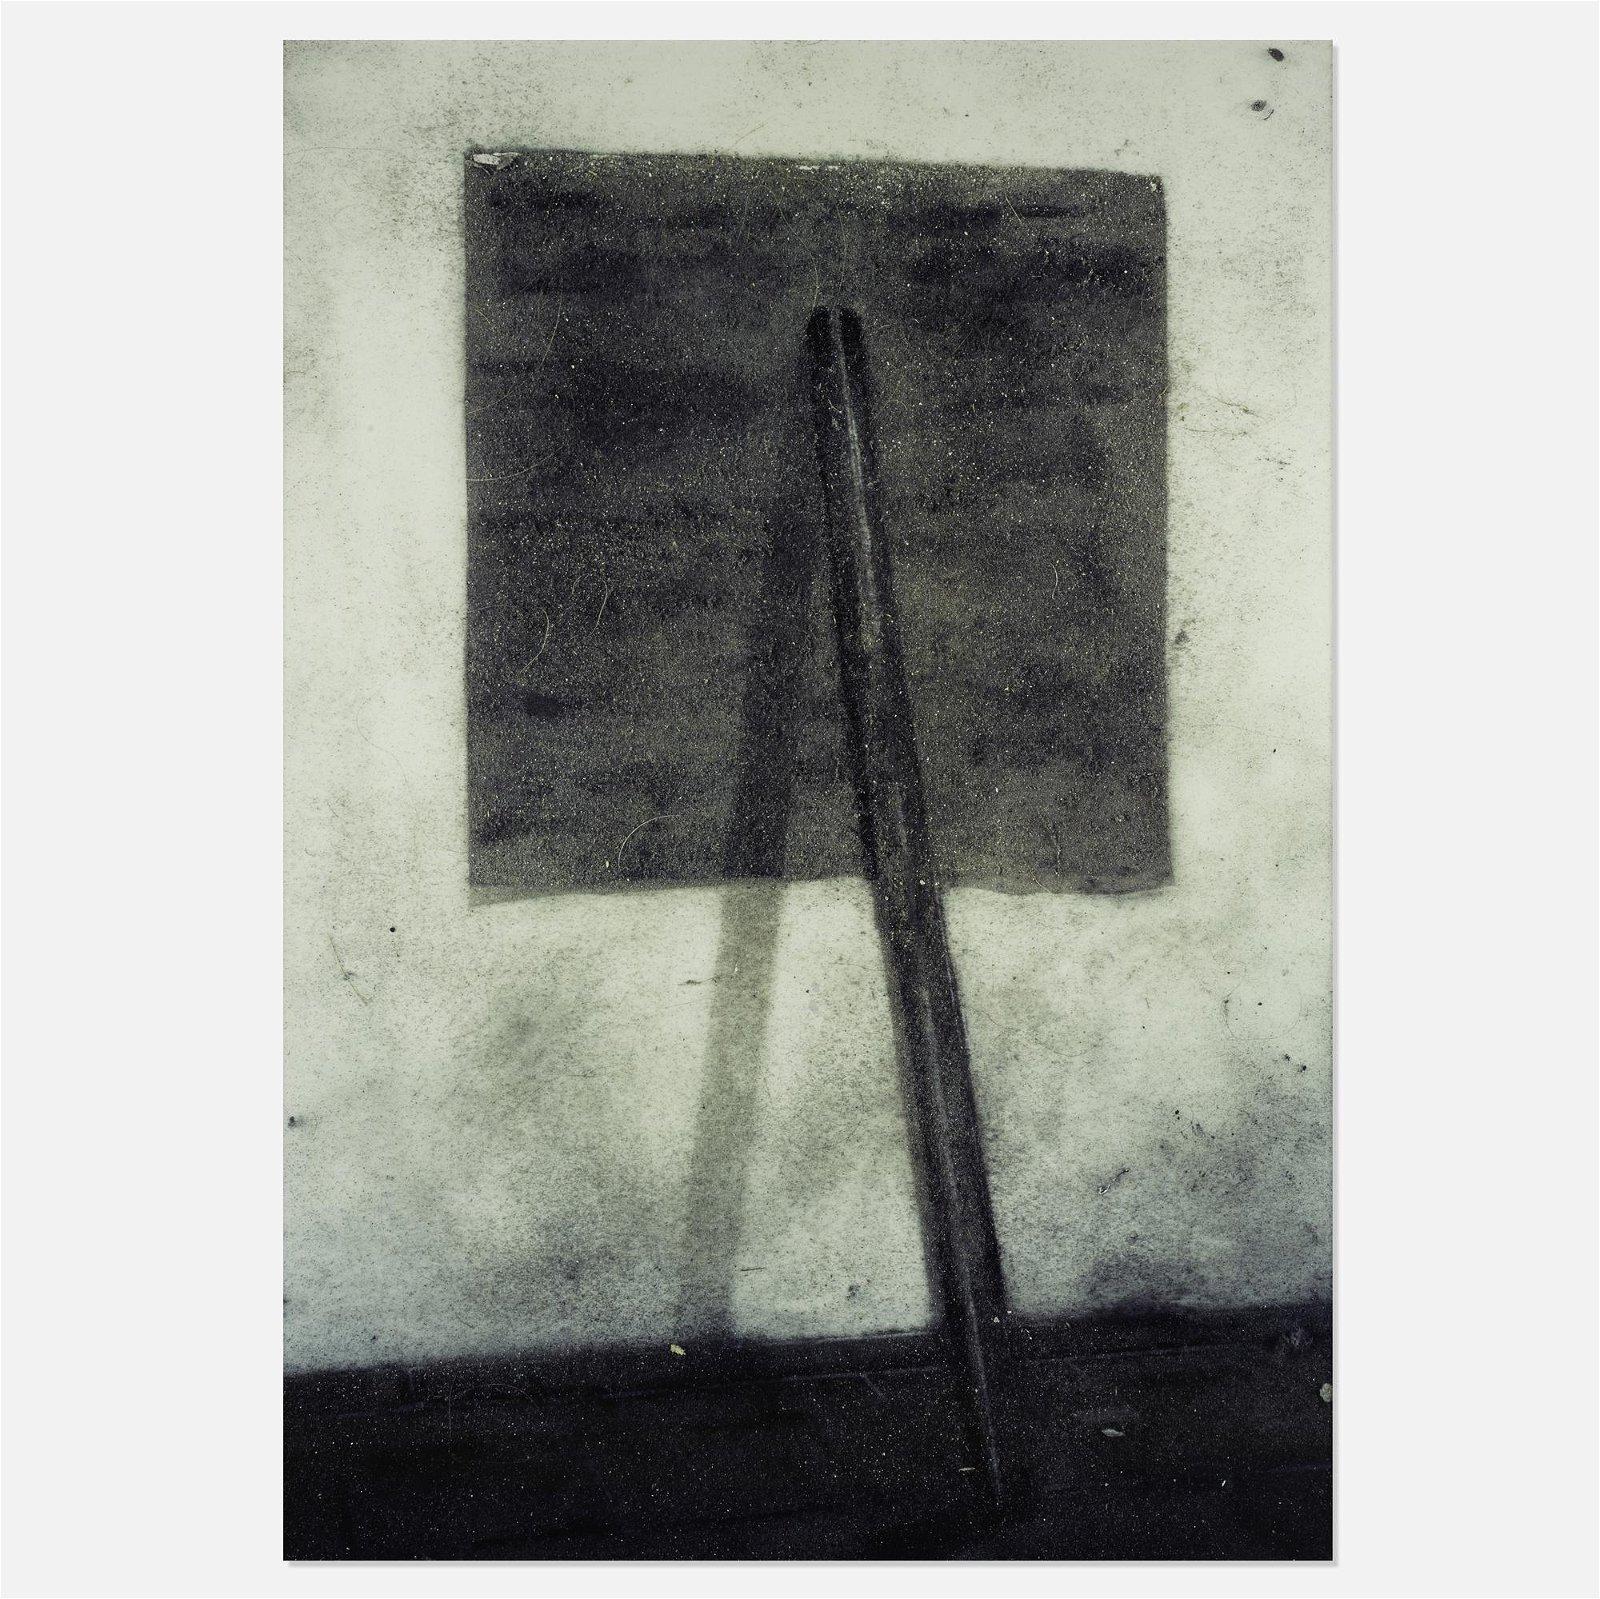 Vik Muniz, After Richard Serra